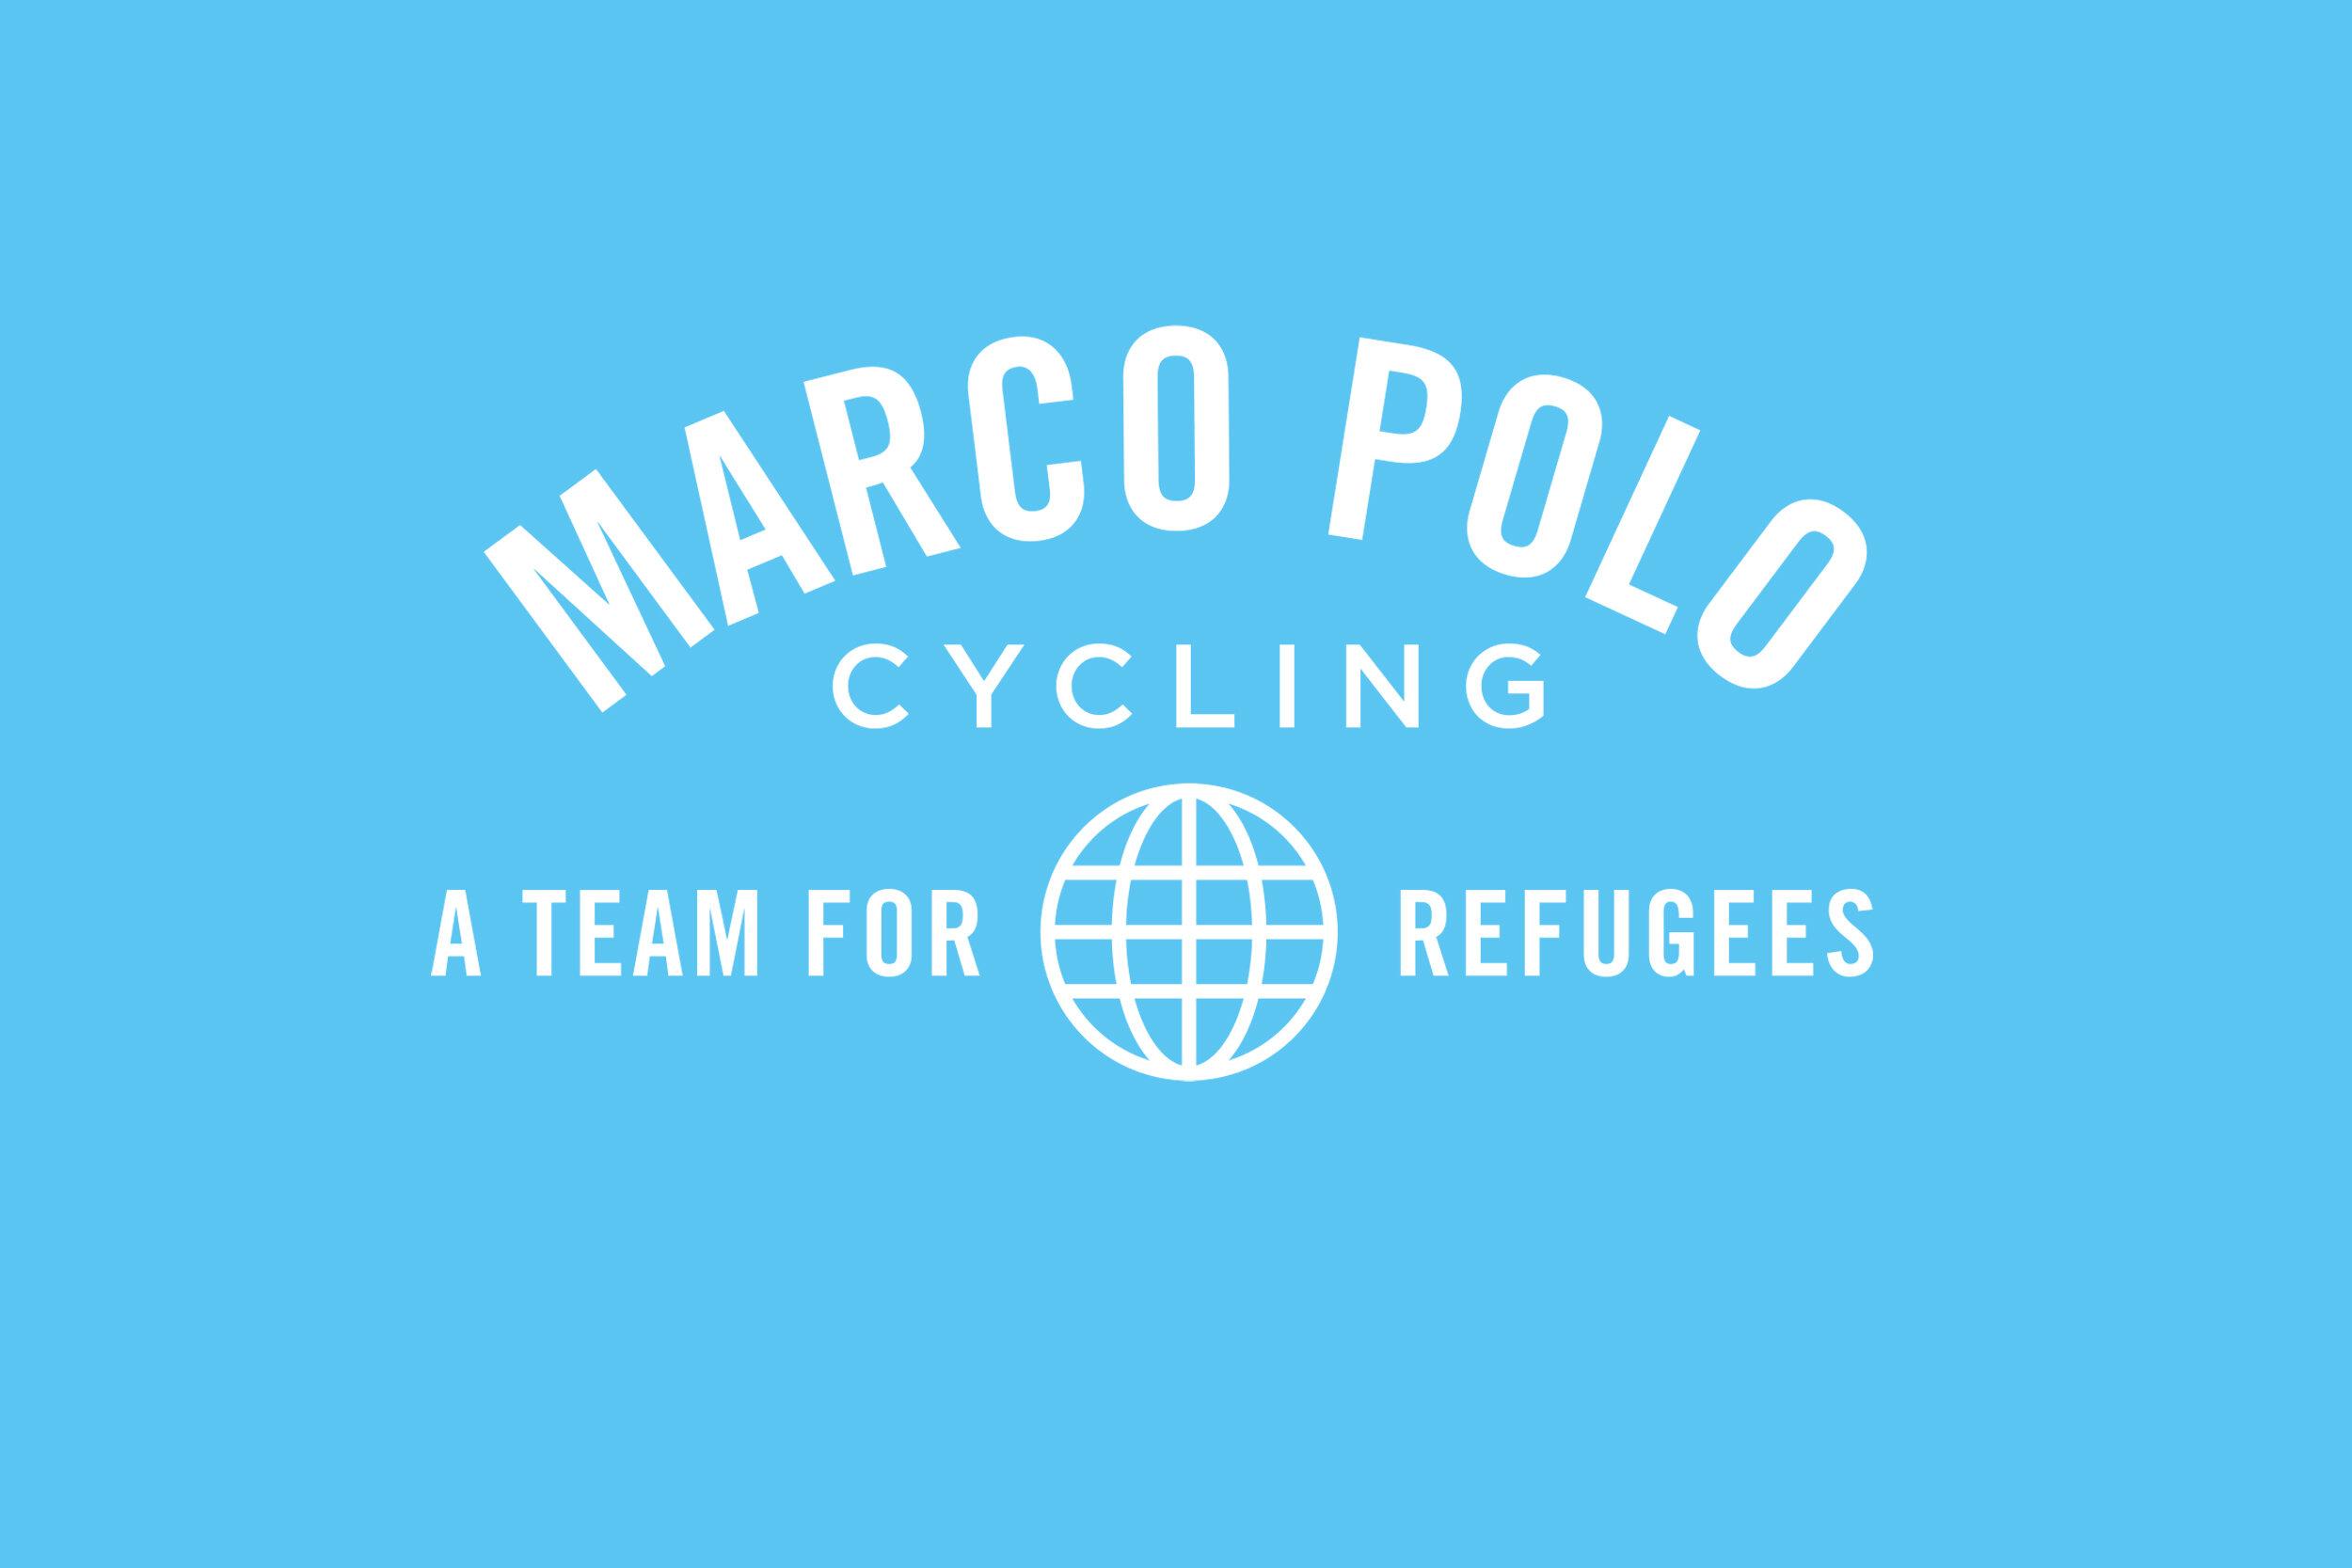 Logo_MarcoPoloCycling2_Shortlife.jpg